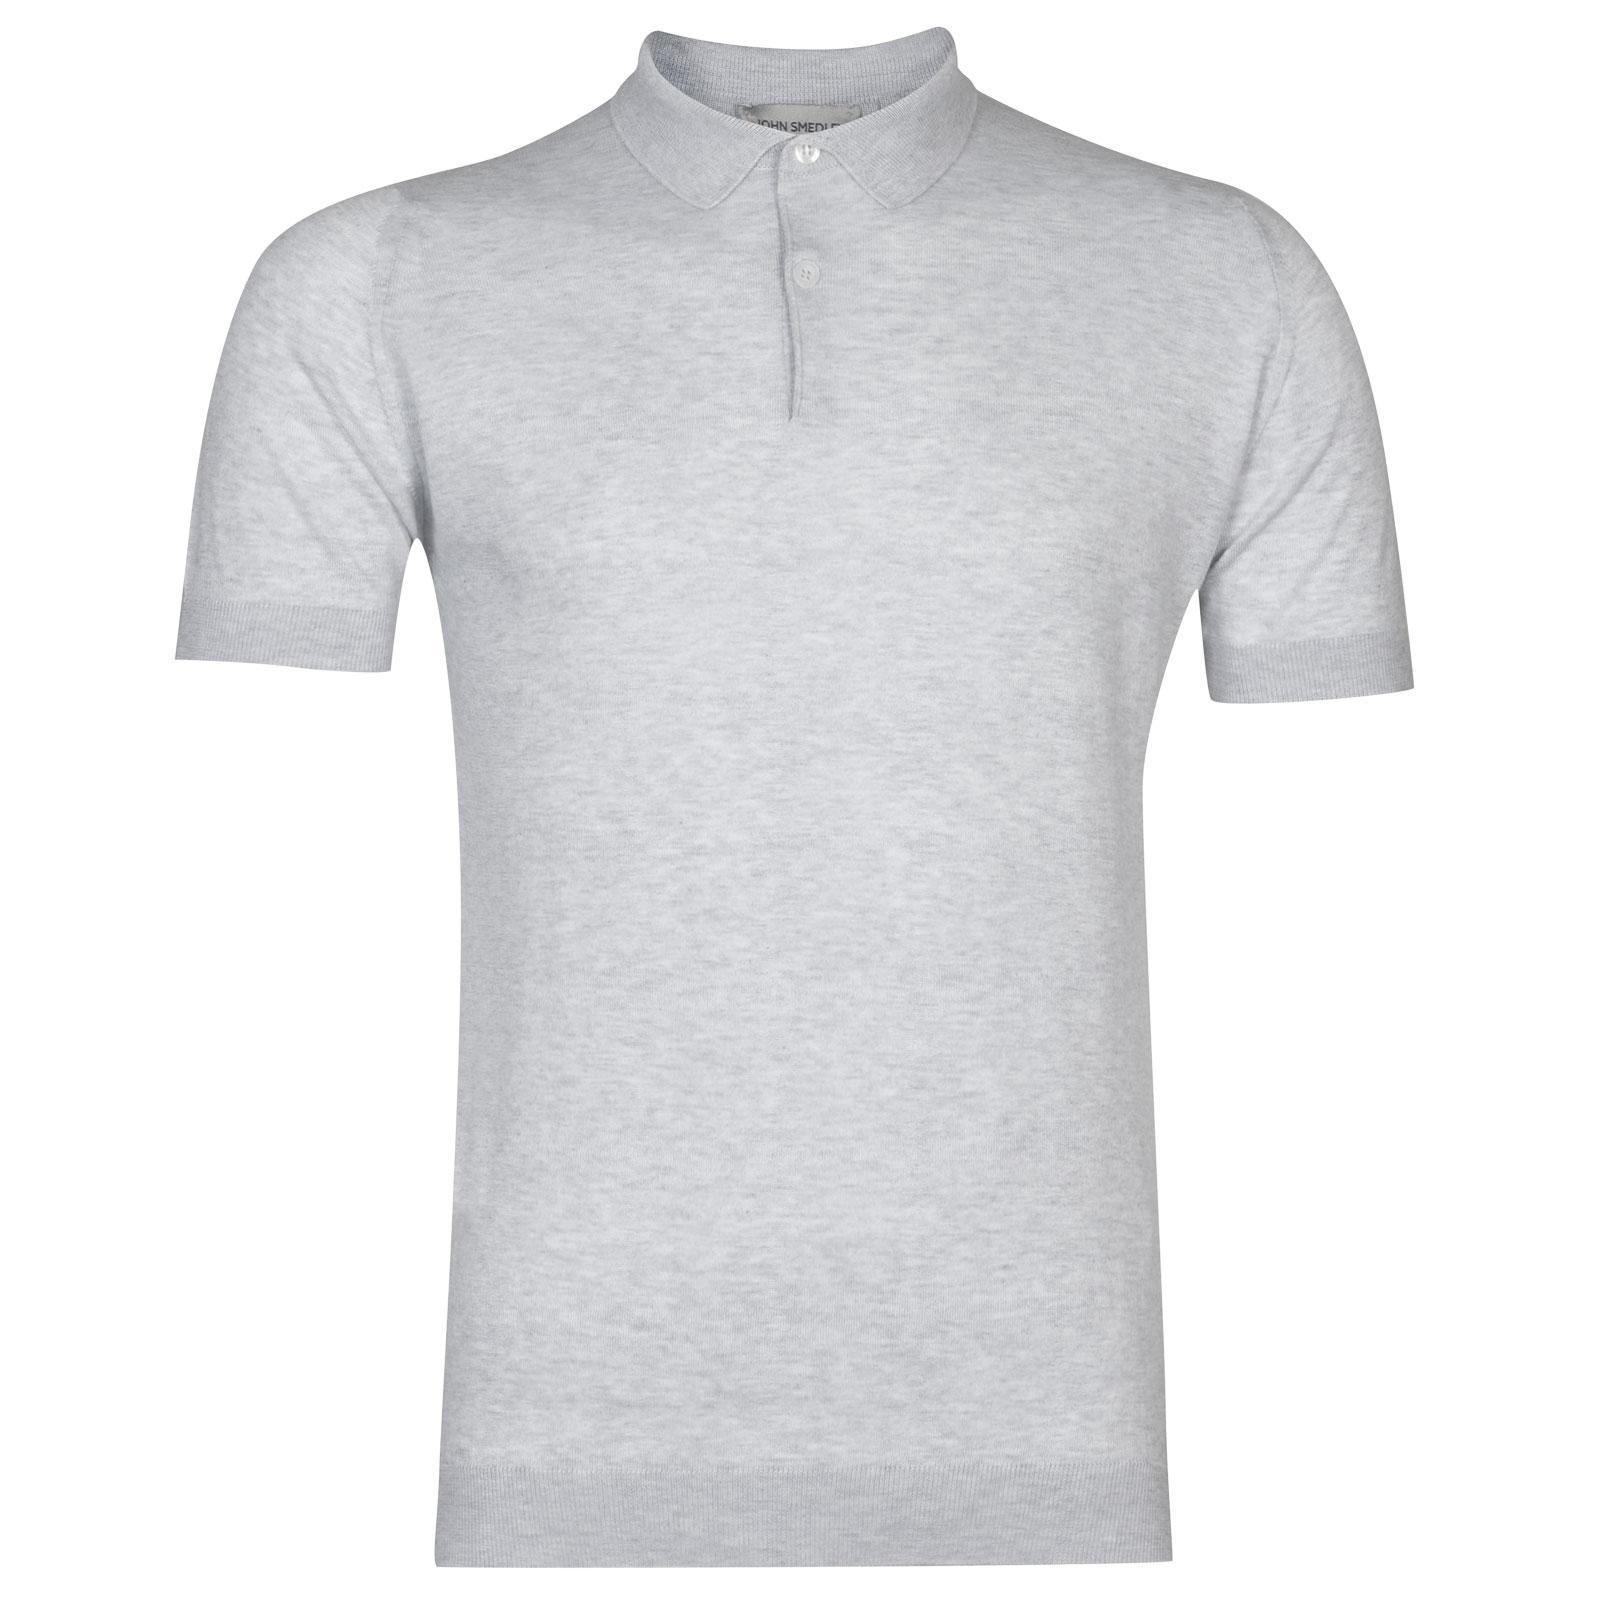 John Smedley rhodes Sea Island Cotton Shirt in Feather Grey-S